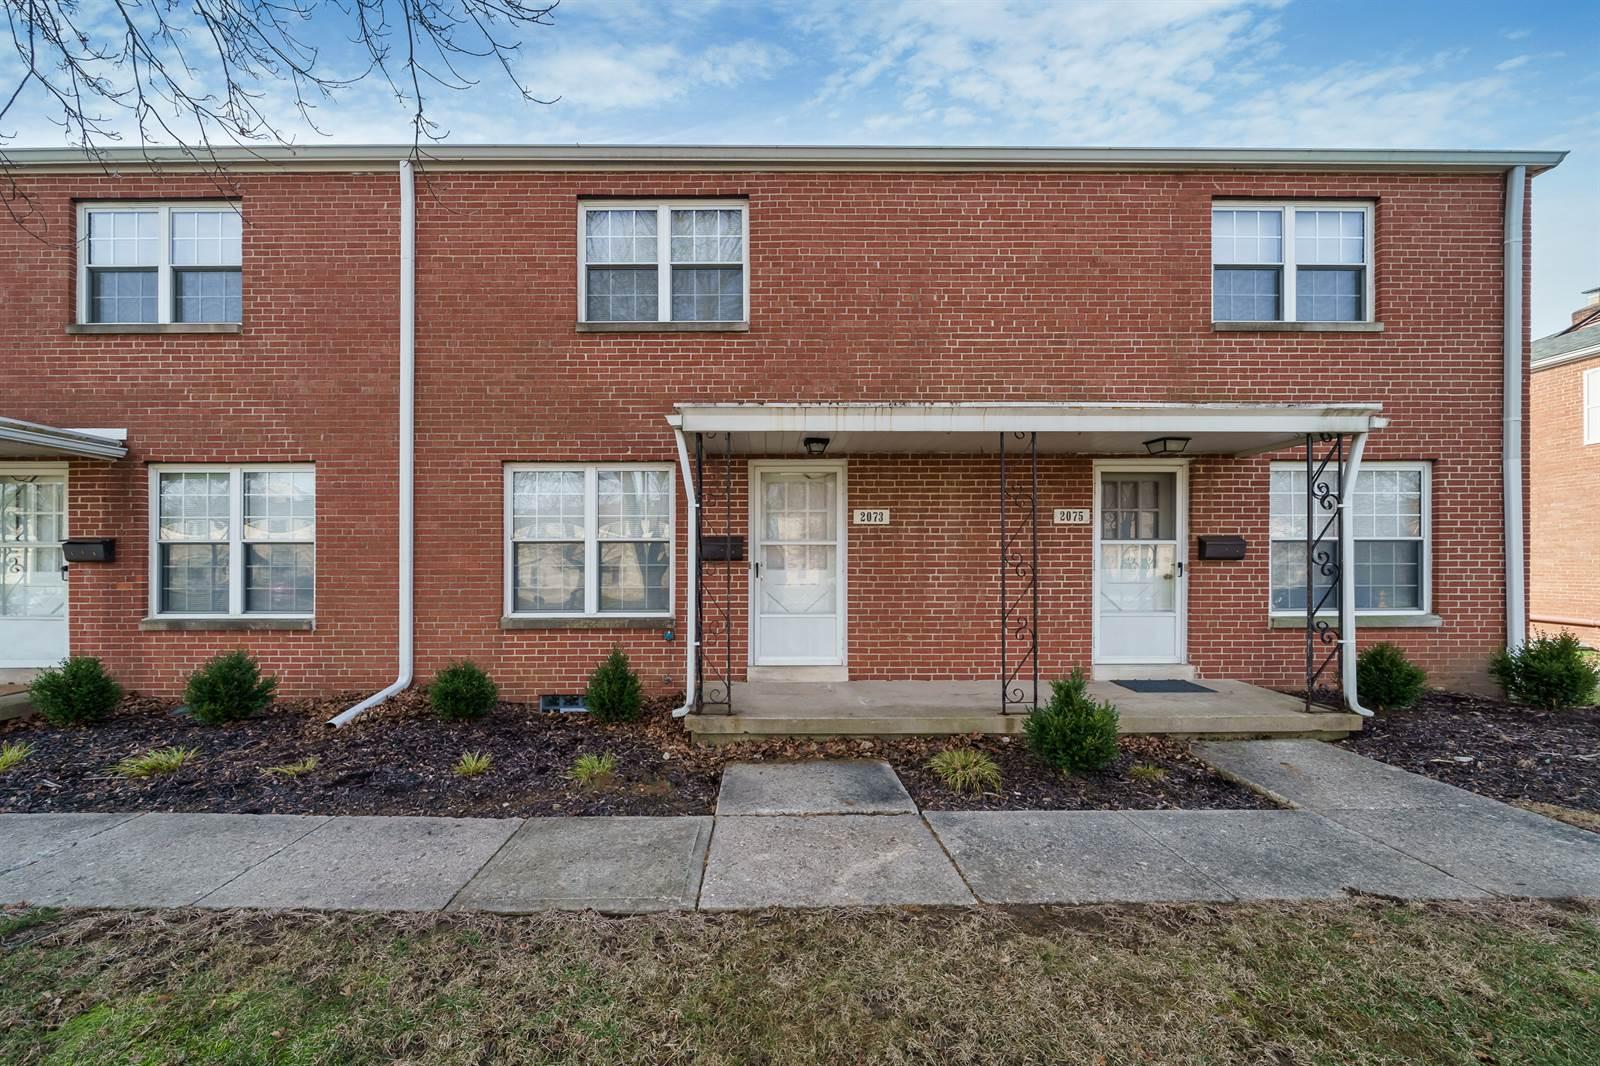 2073 Ridgeview Rd, Upper Arlington, OH 43221